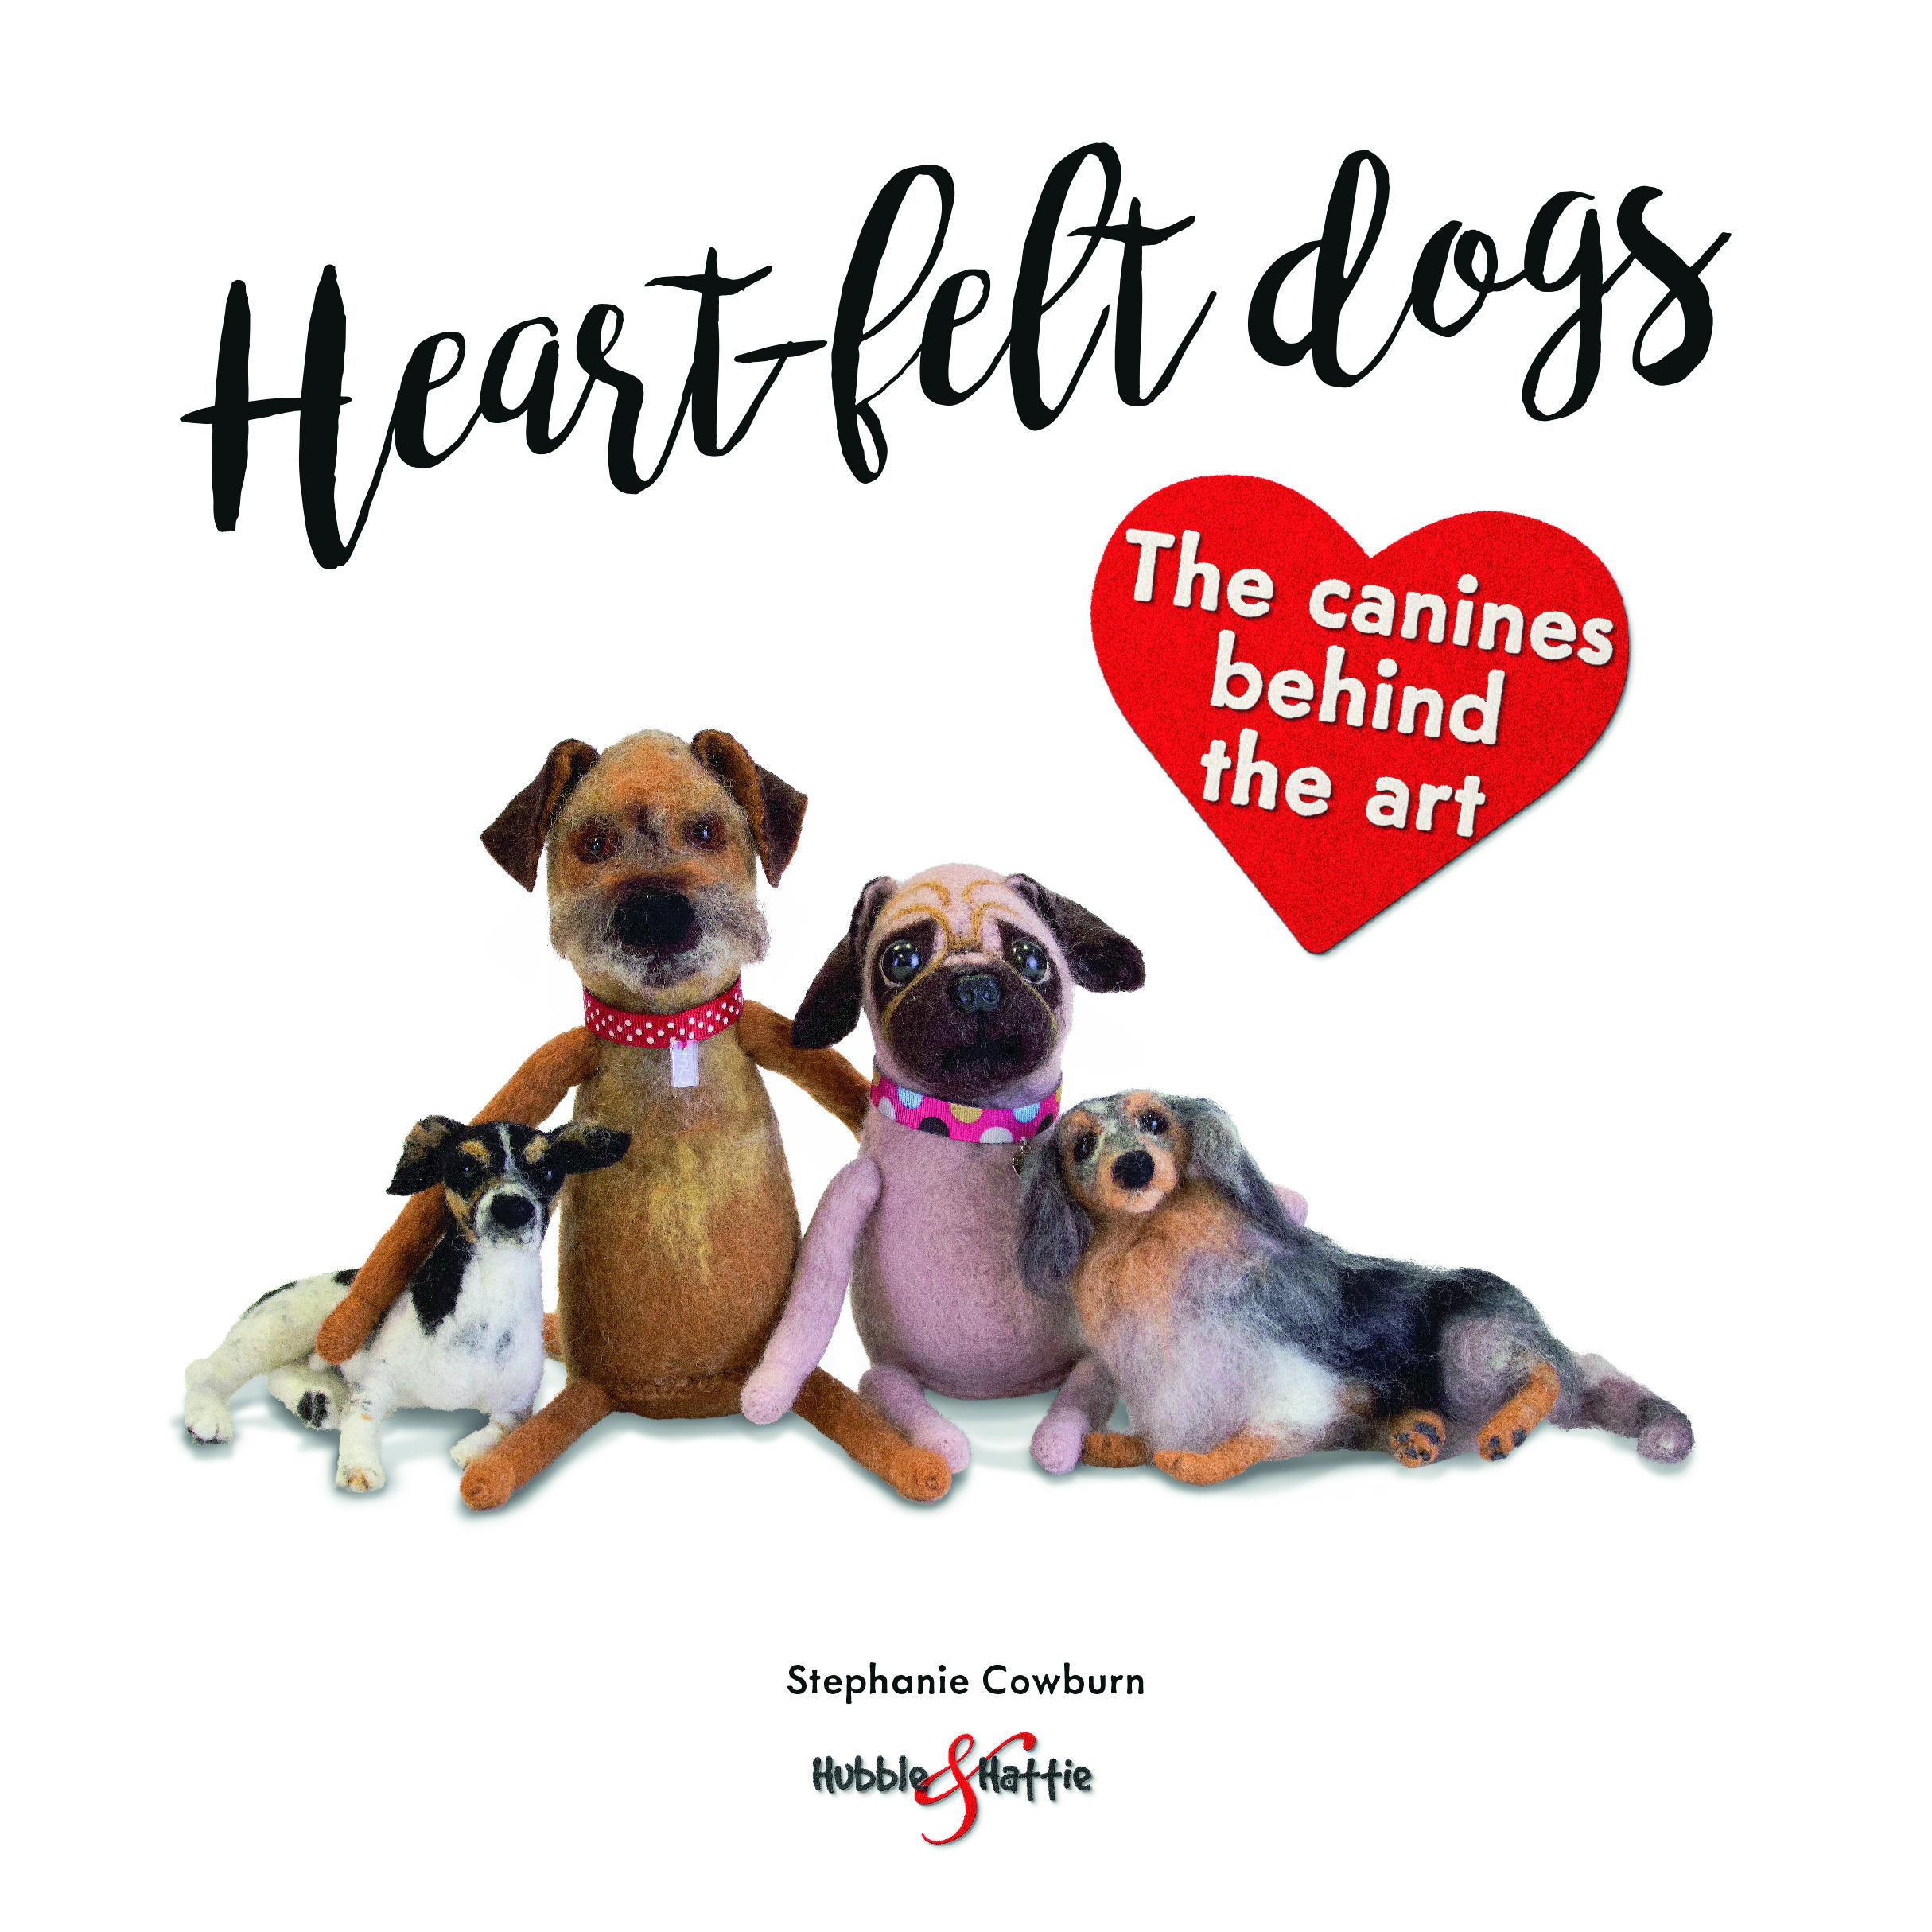 Heart-felt dogs